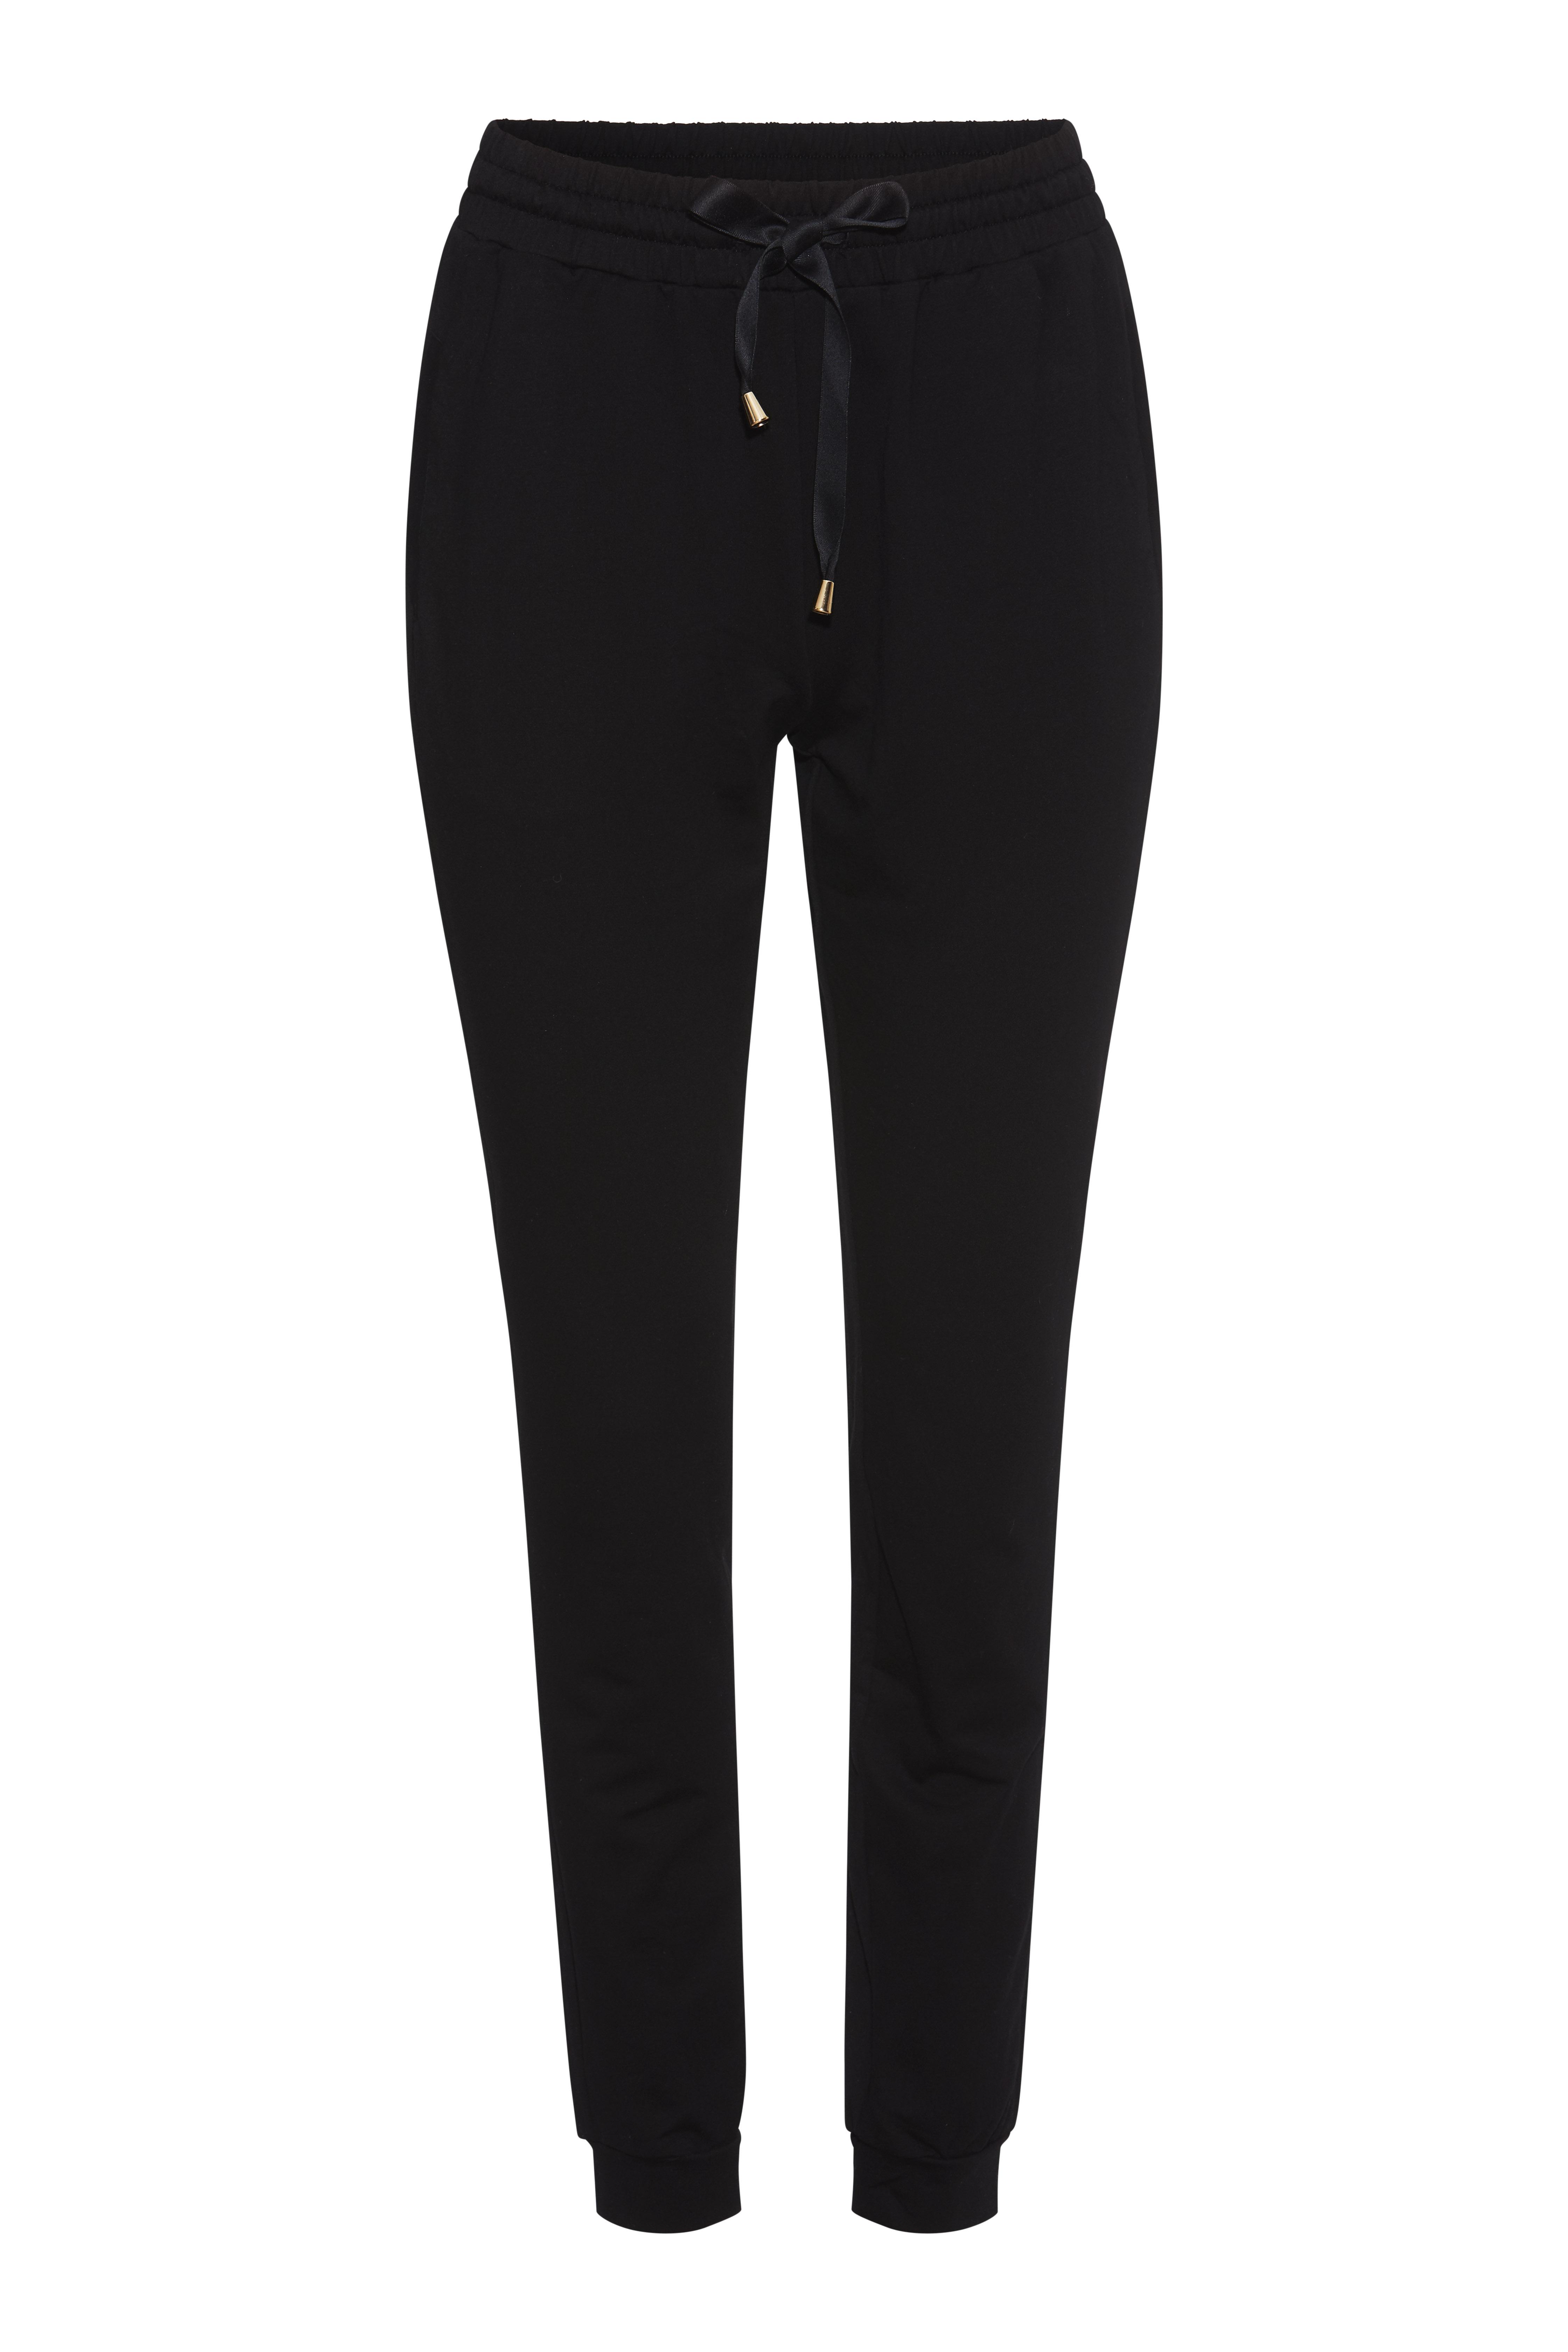 PBO Jalli bukser, black, x-large